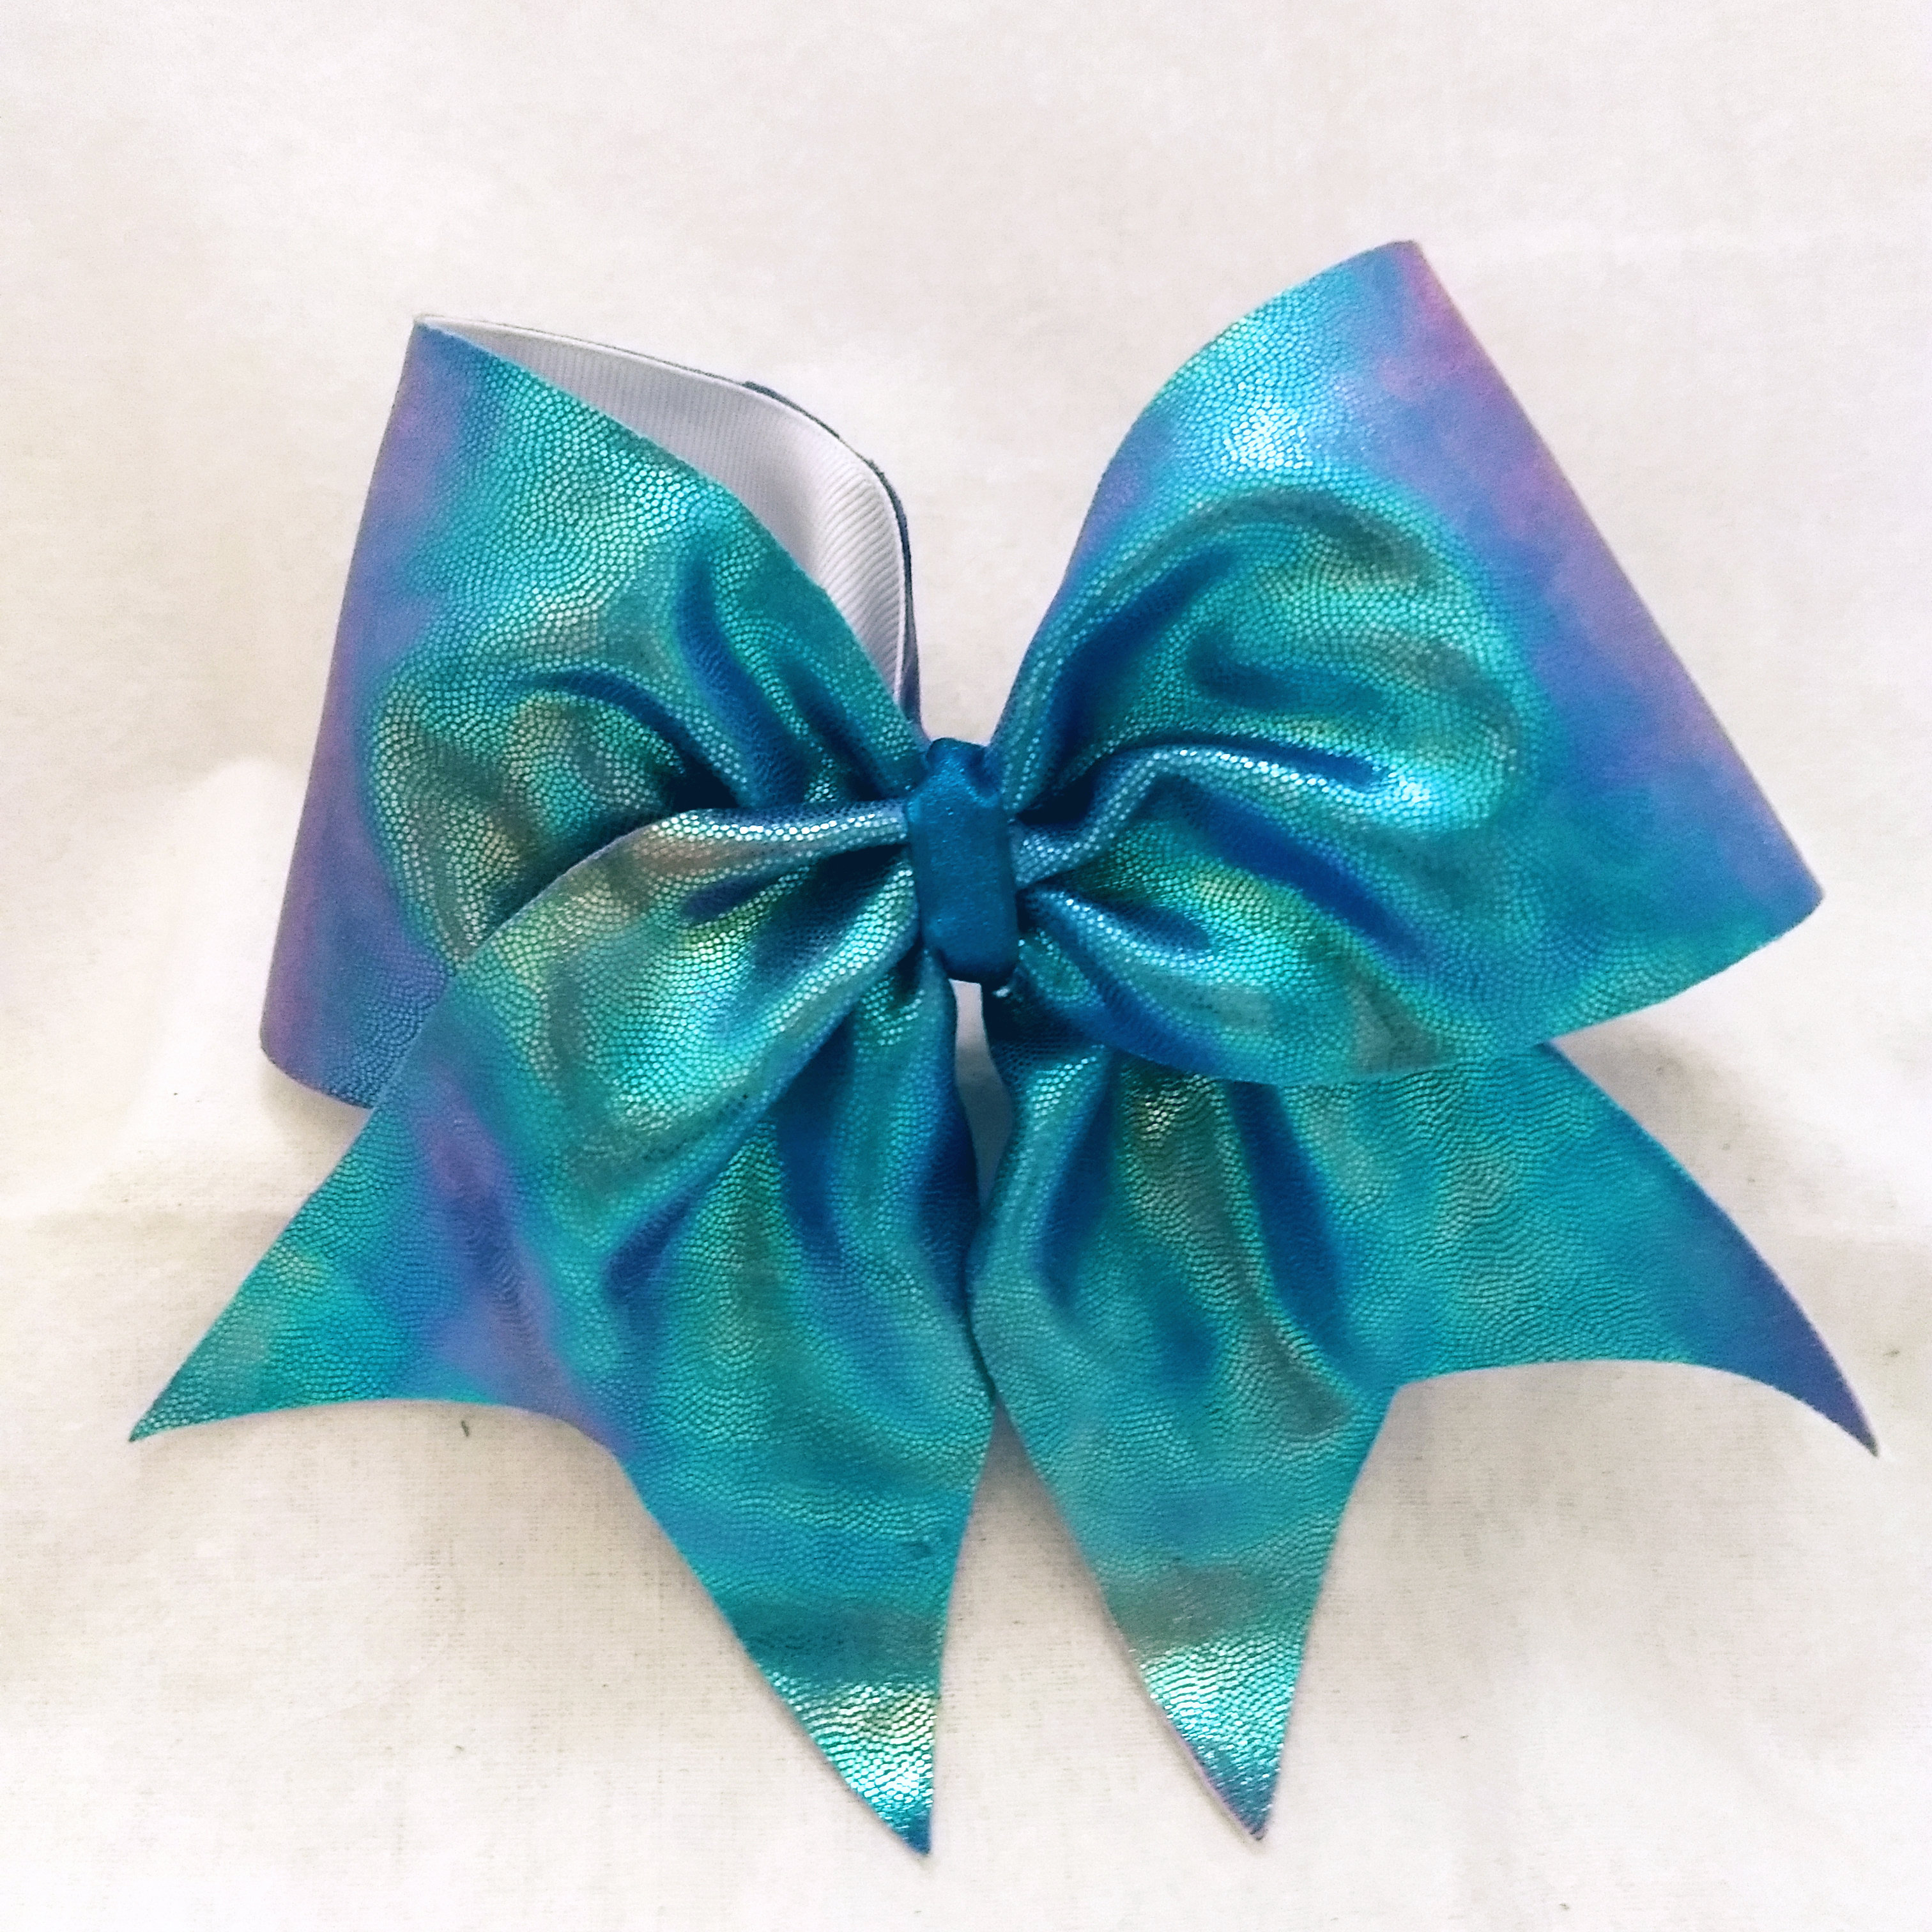 Aqua Tones Tie-Dye Cheer Bow